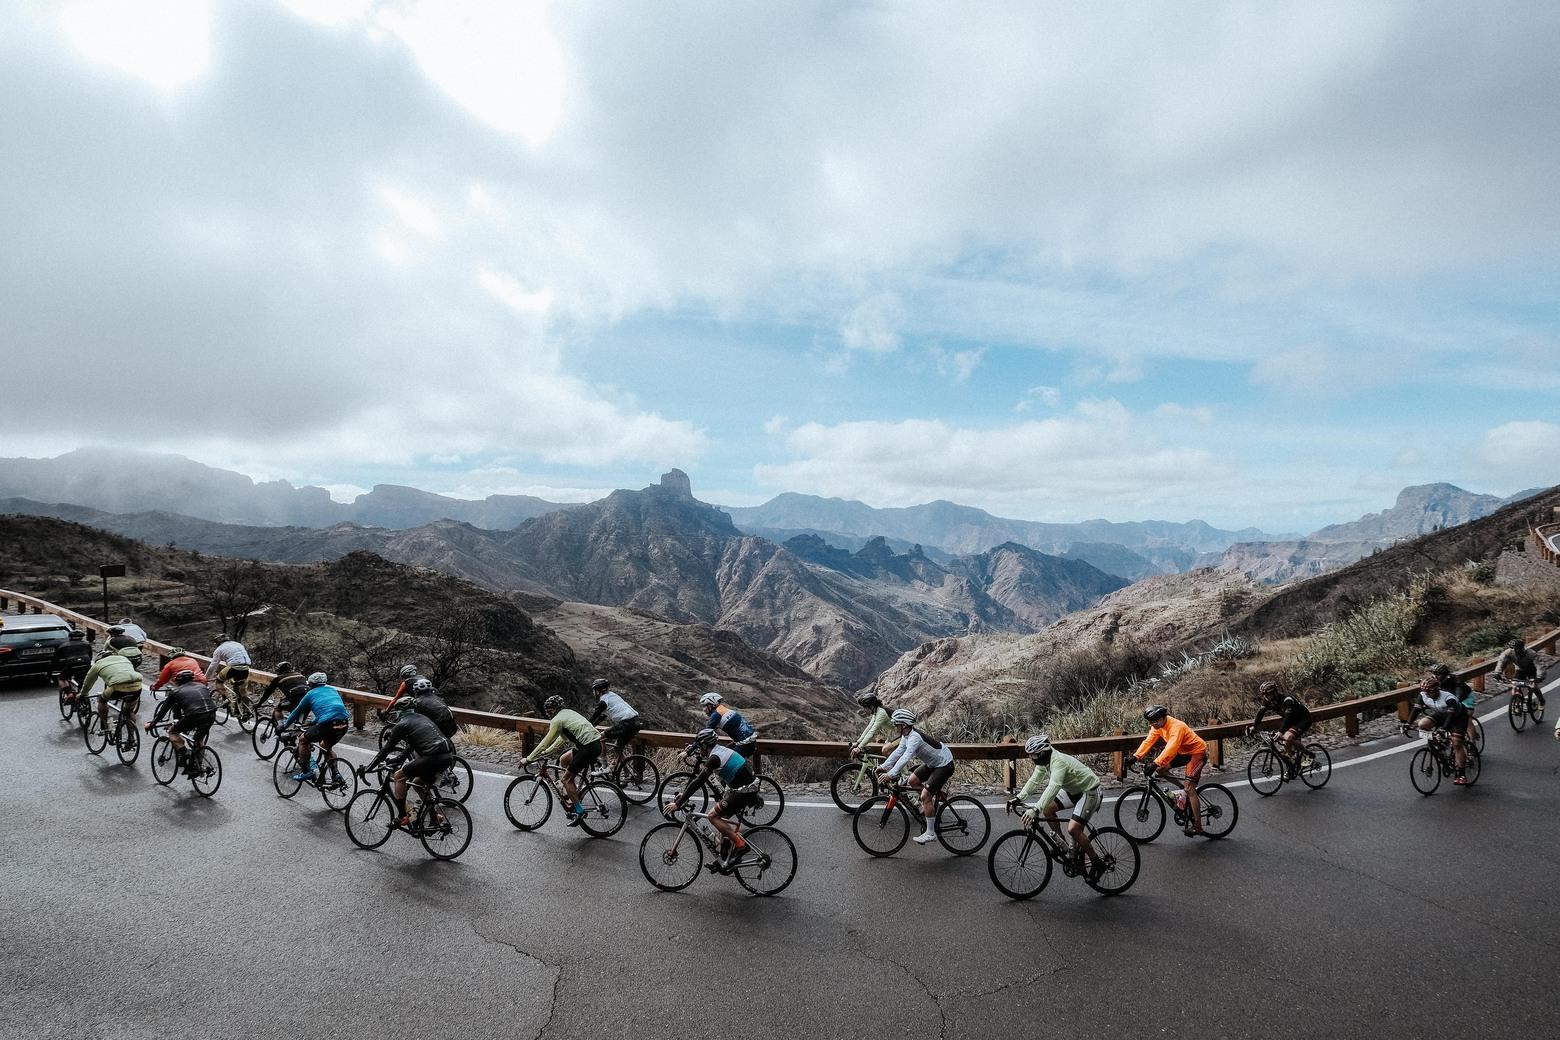 Un etapa de las que marcan época, en tercer dia de la Gran Canaria Bike Week